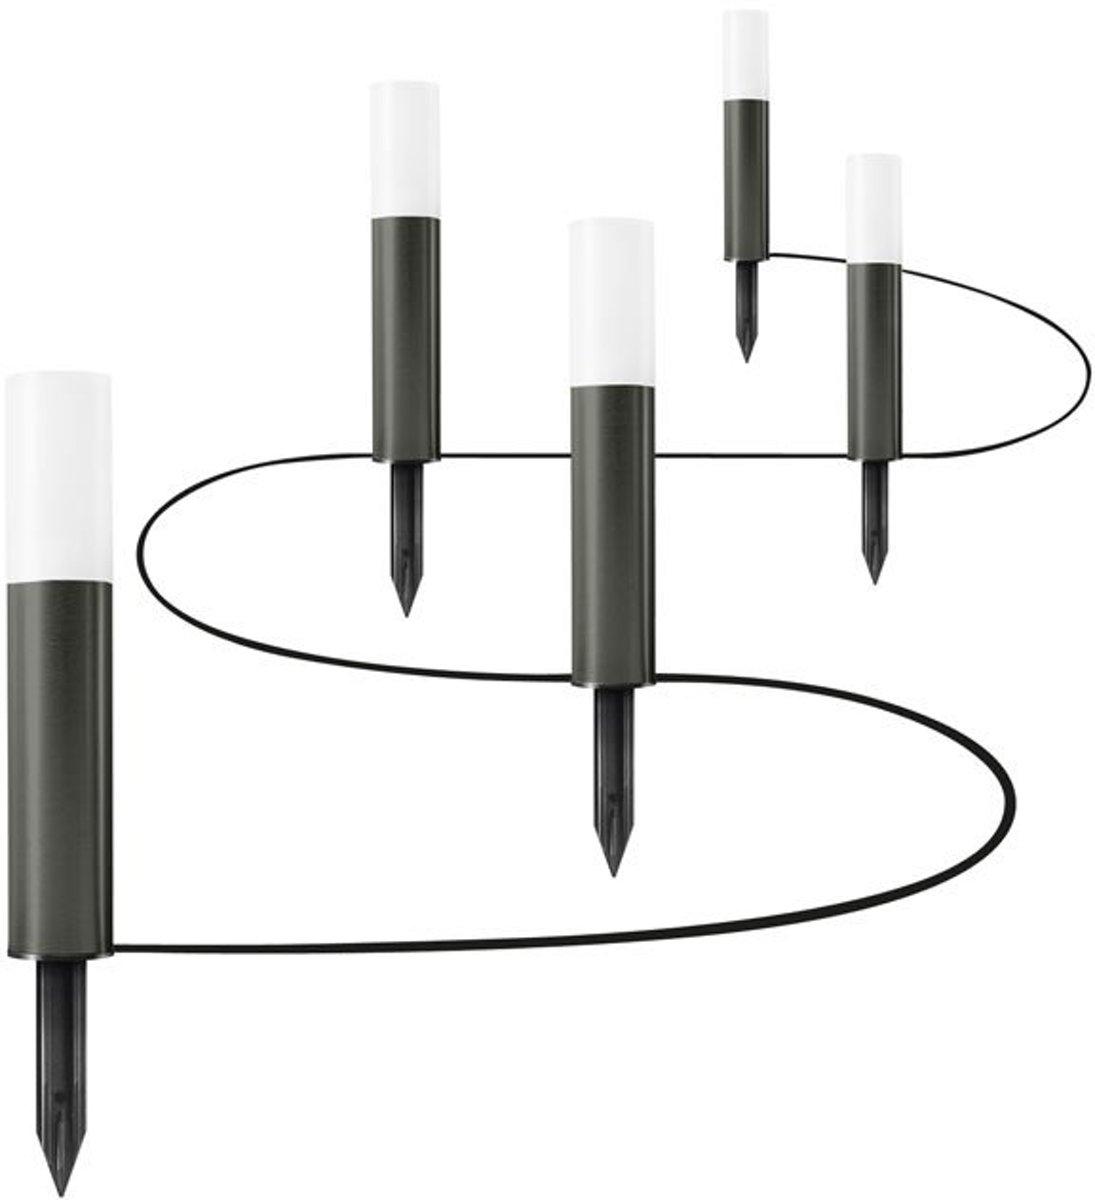 Ledvance 5x LED grondspies antraciet 5.5W Endura Garden Pole kopen